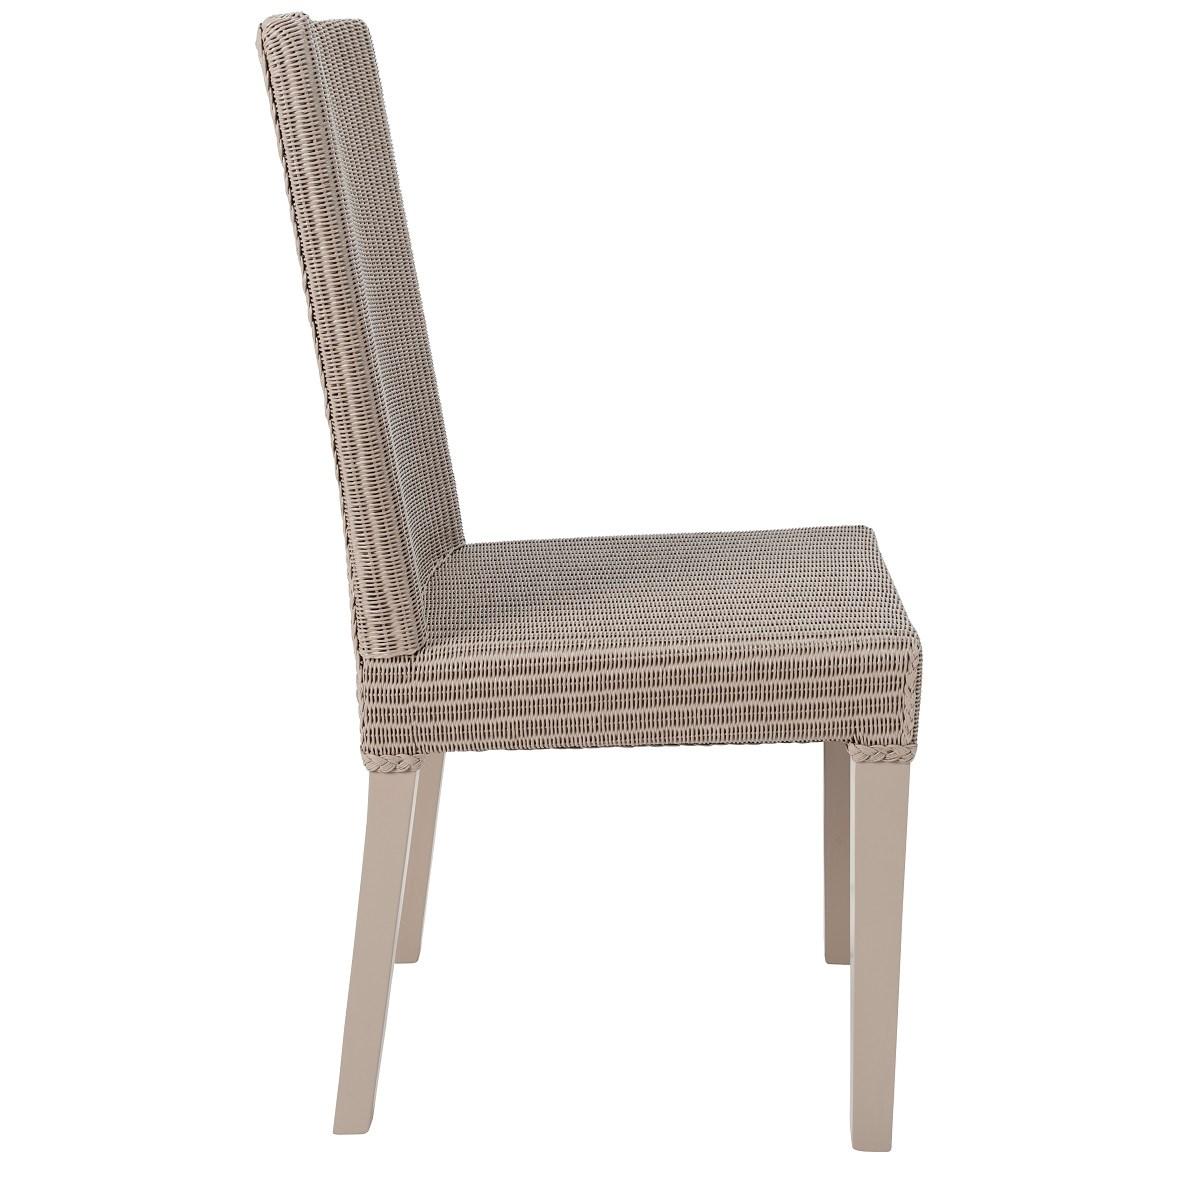 Chaise en Lloyd Loom gris souris